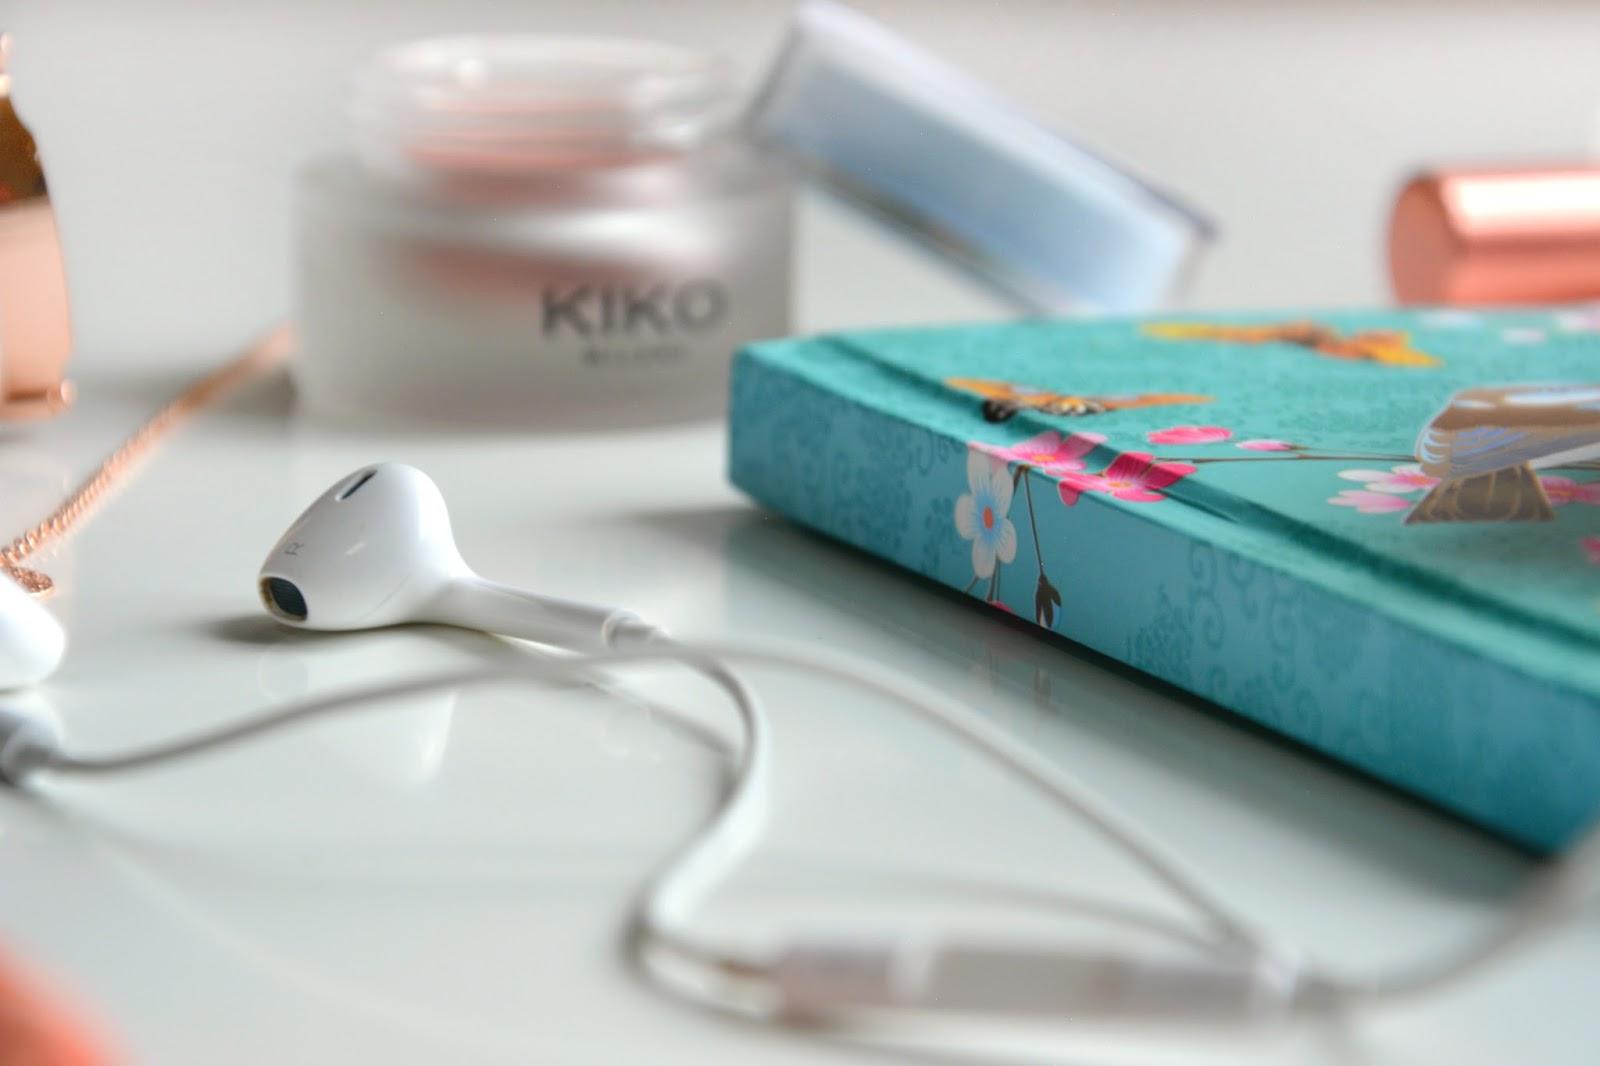 Apple EarPods; Kiko Less Is Better Cream Blush; notebook